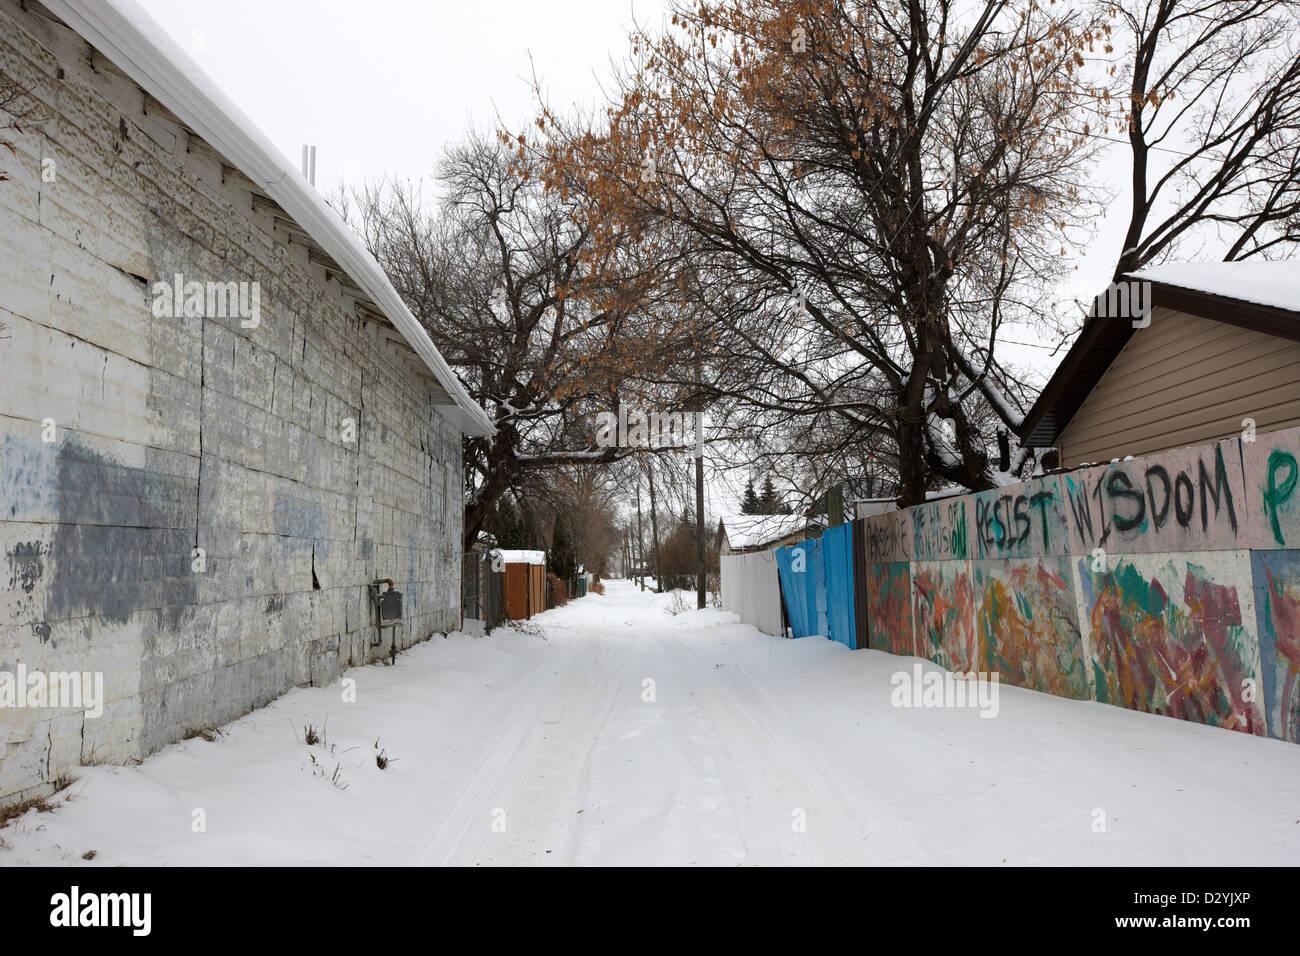 snow covered rear alleyway between houses in Saskatoon Saskatchewan Canada - Stock Image